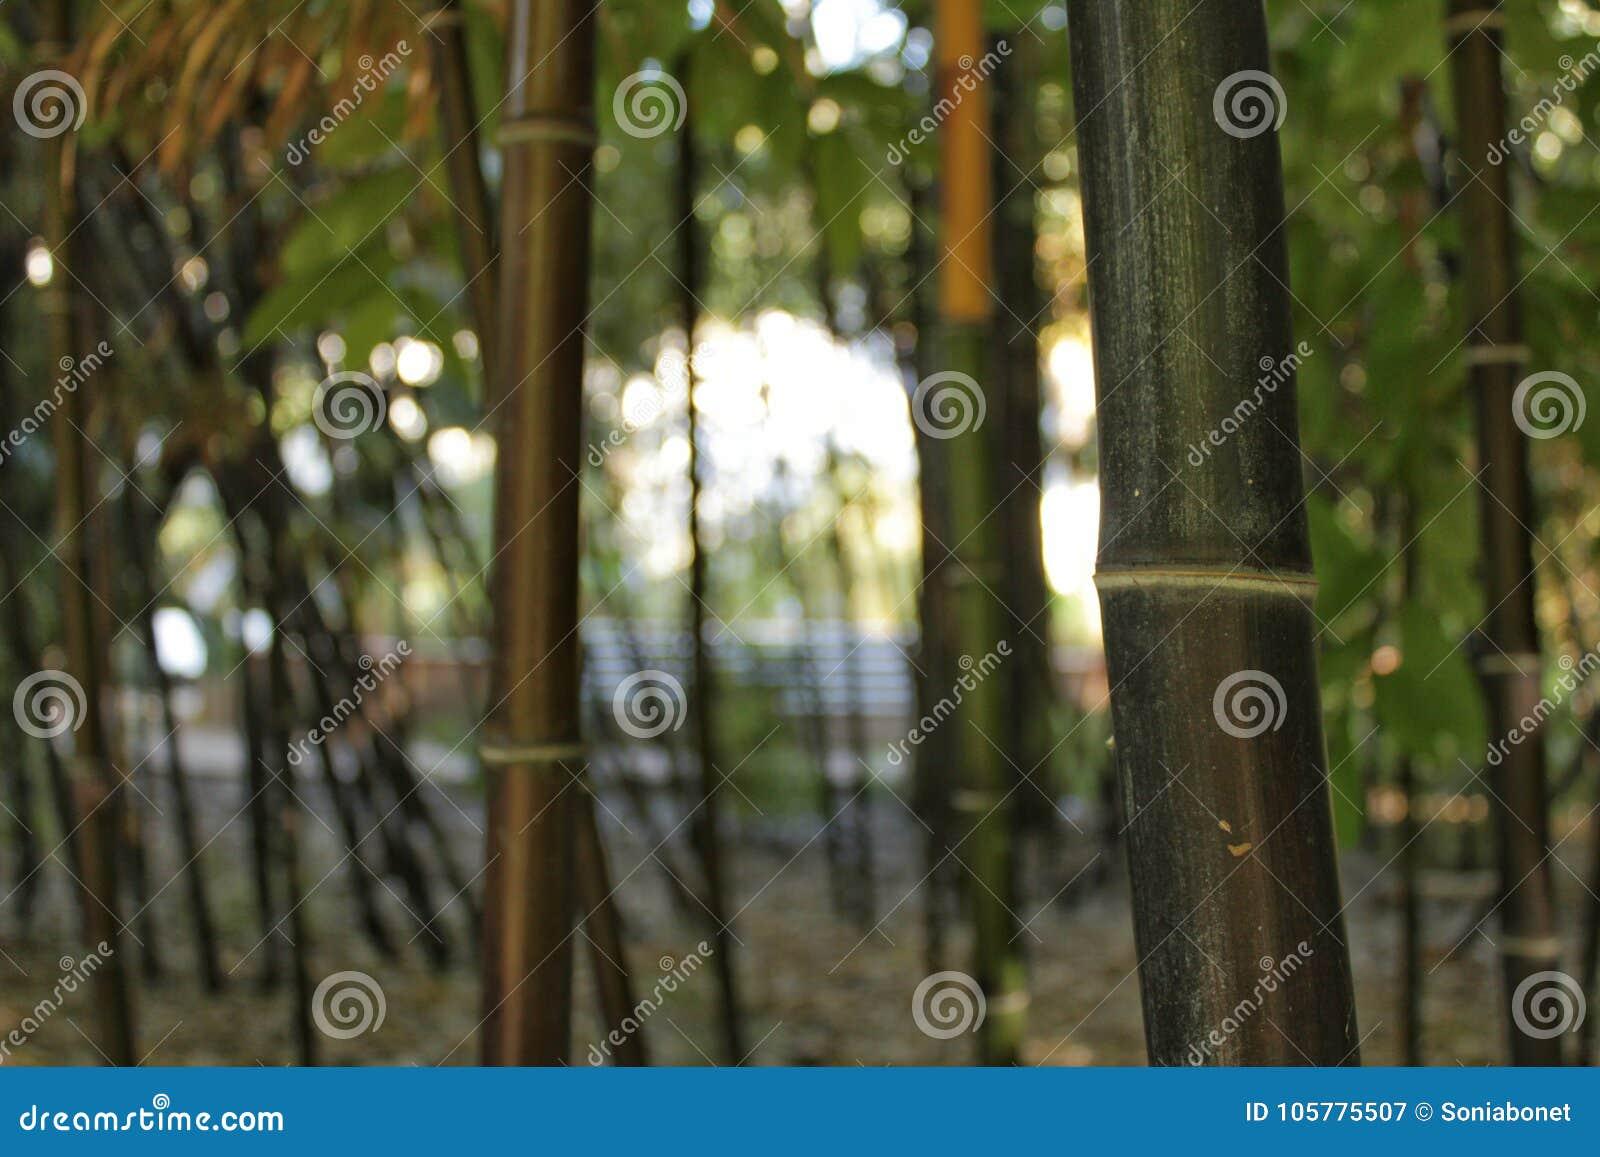 Negro do Phyllostachys, bambu preto no jardim, Valência